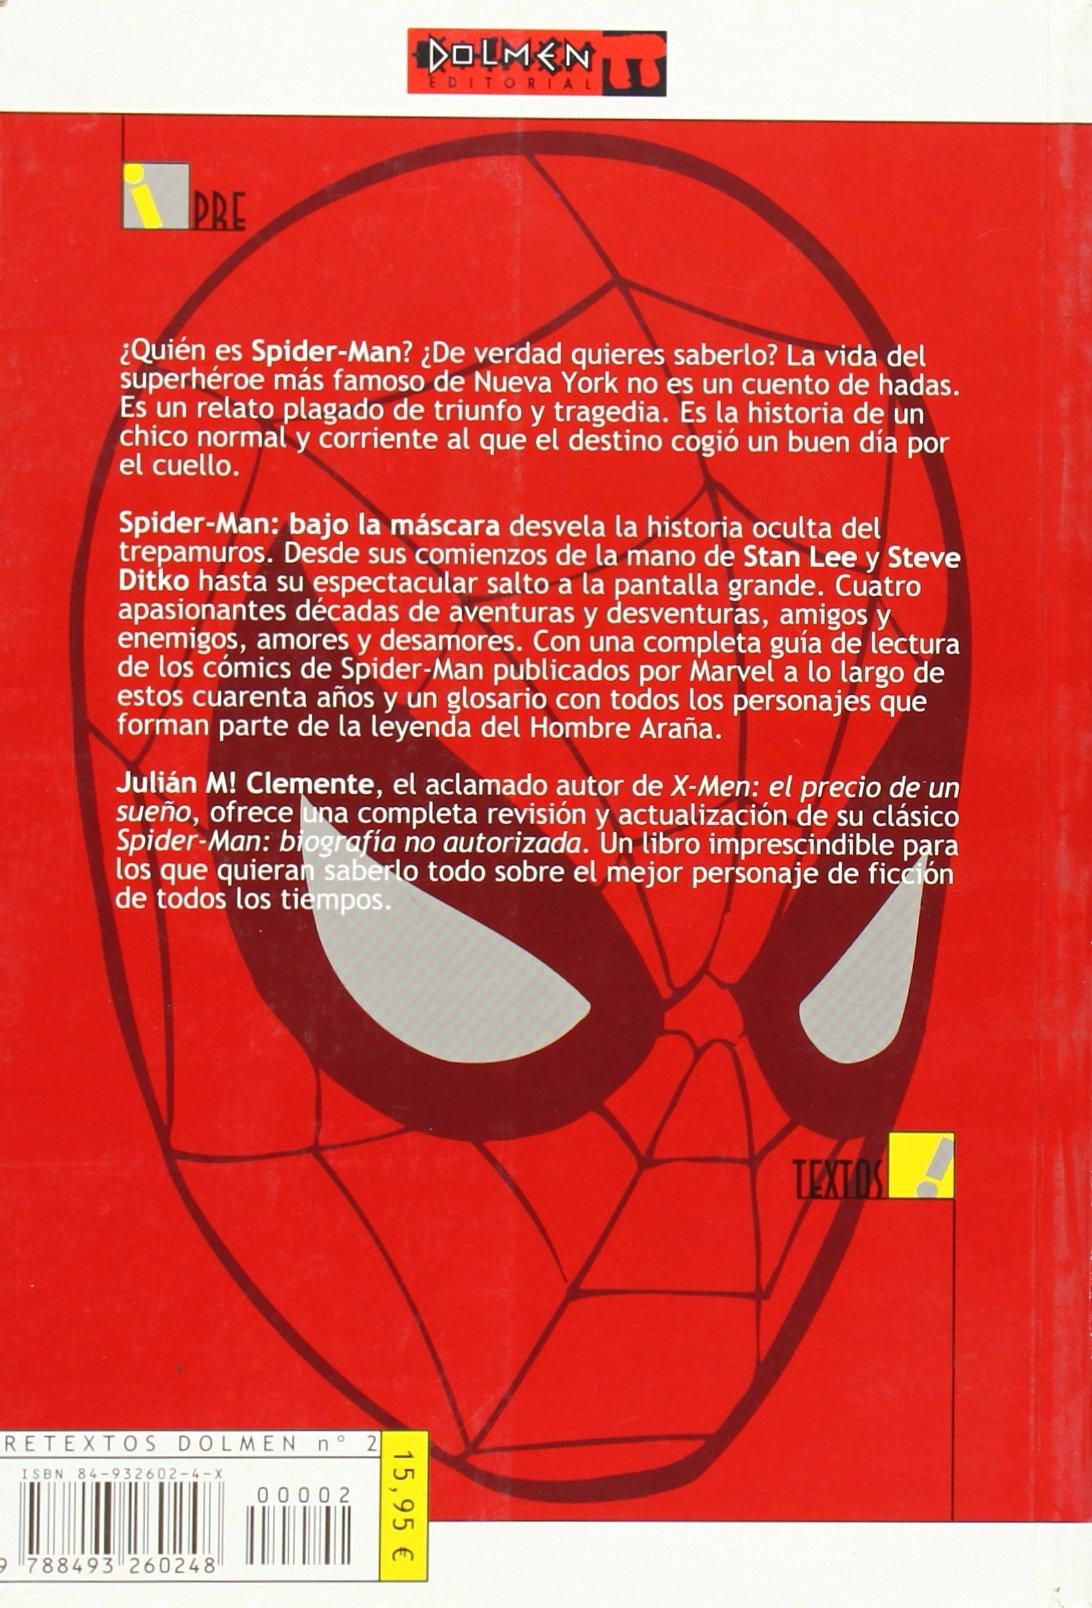 SPIDERMAN. BAJO LA MASCARA (JULIAN CLEMENTE) PRETEXTOS DOLMEN 02: Julián H. Clemente Campos: 9788493260248: Amazon.com: Books